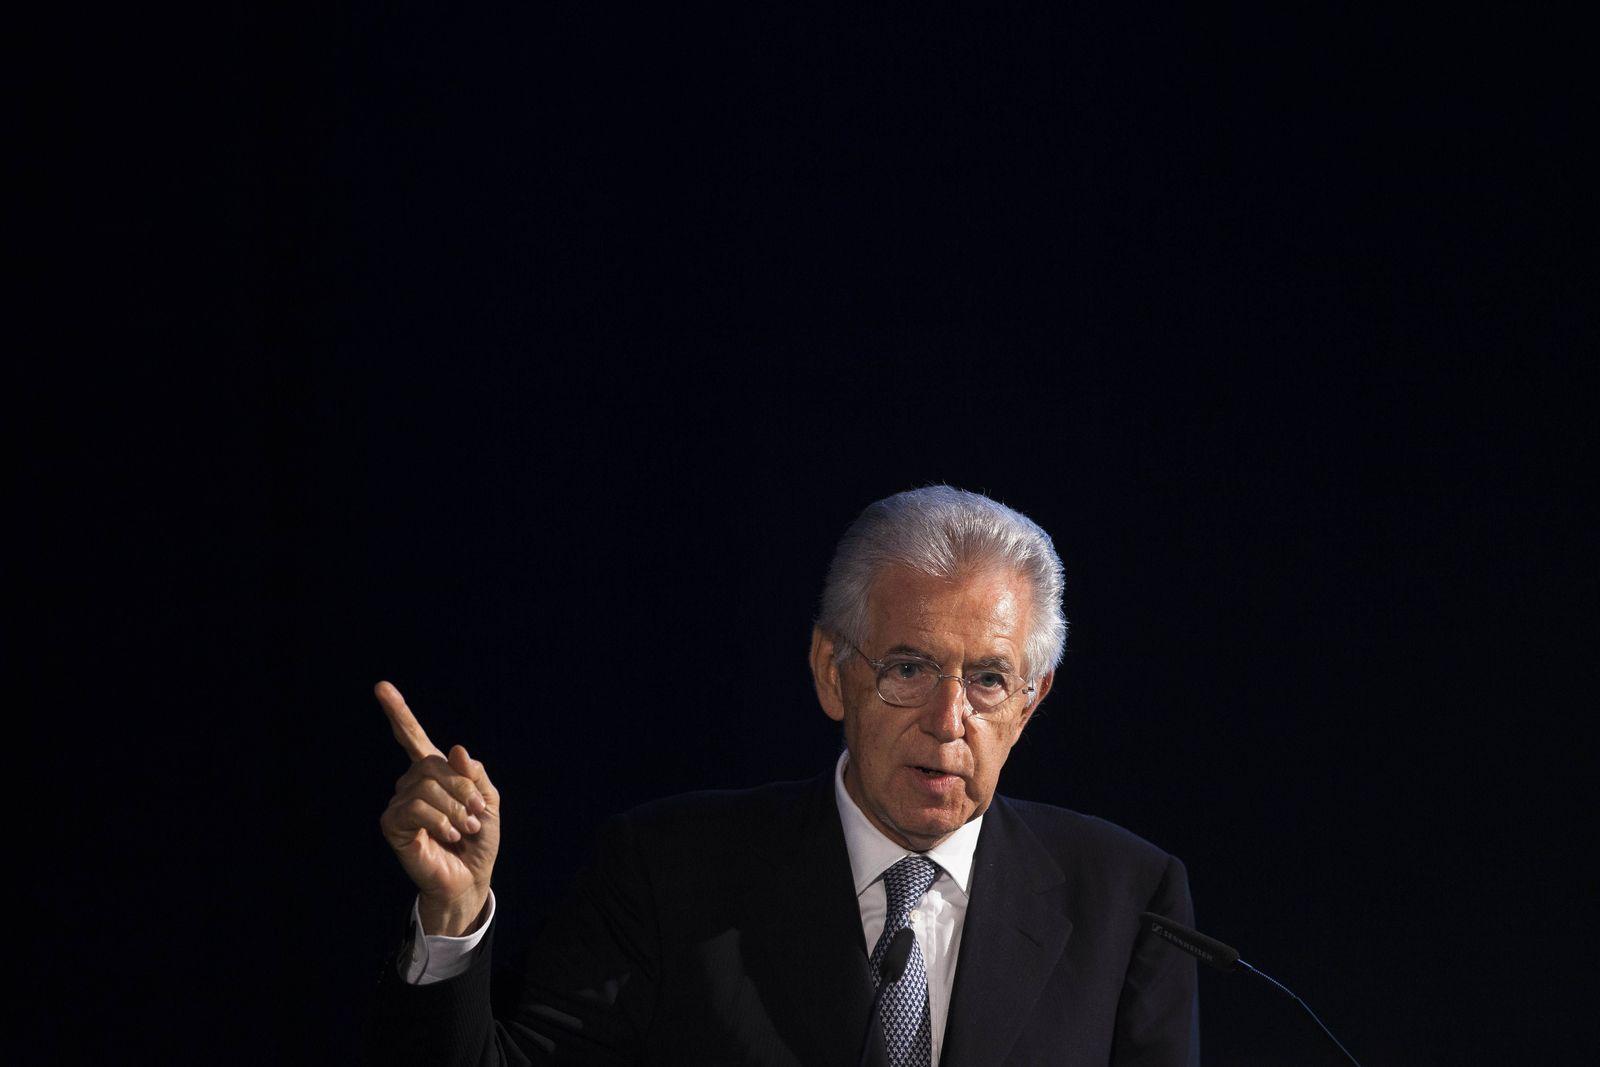 Germany Italy Europe Crisis Monti